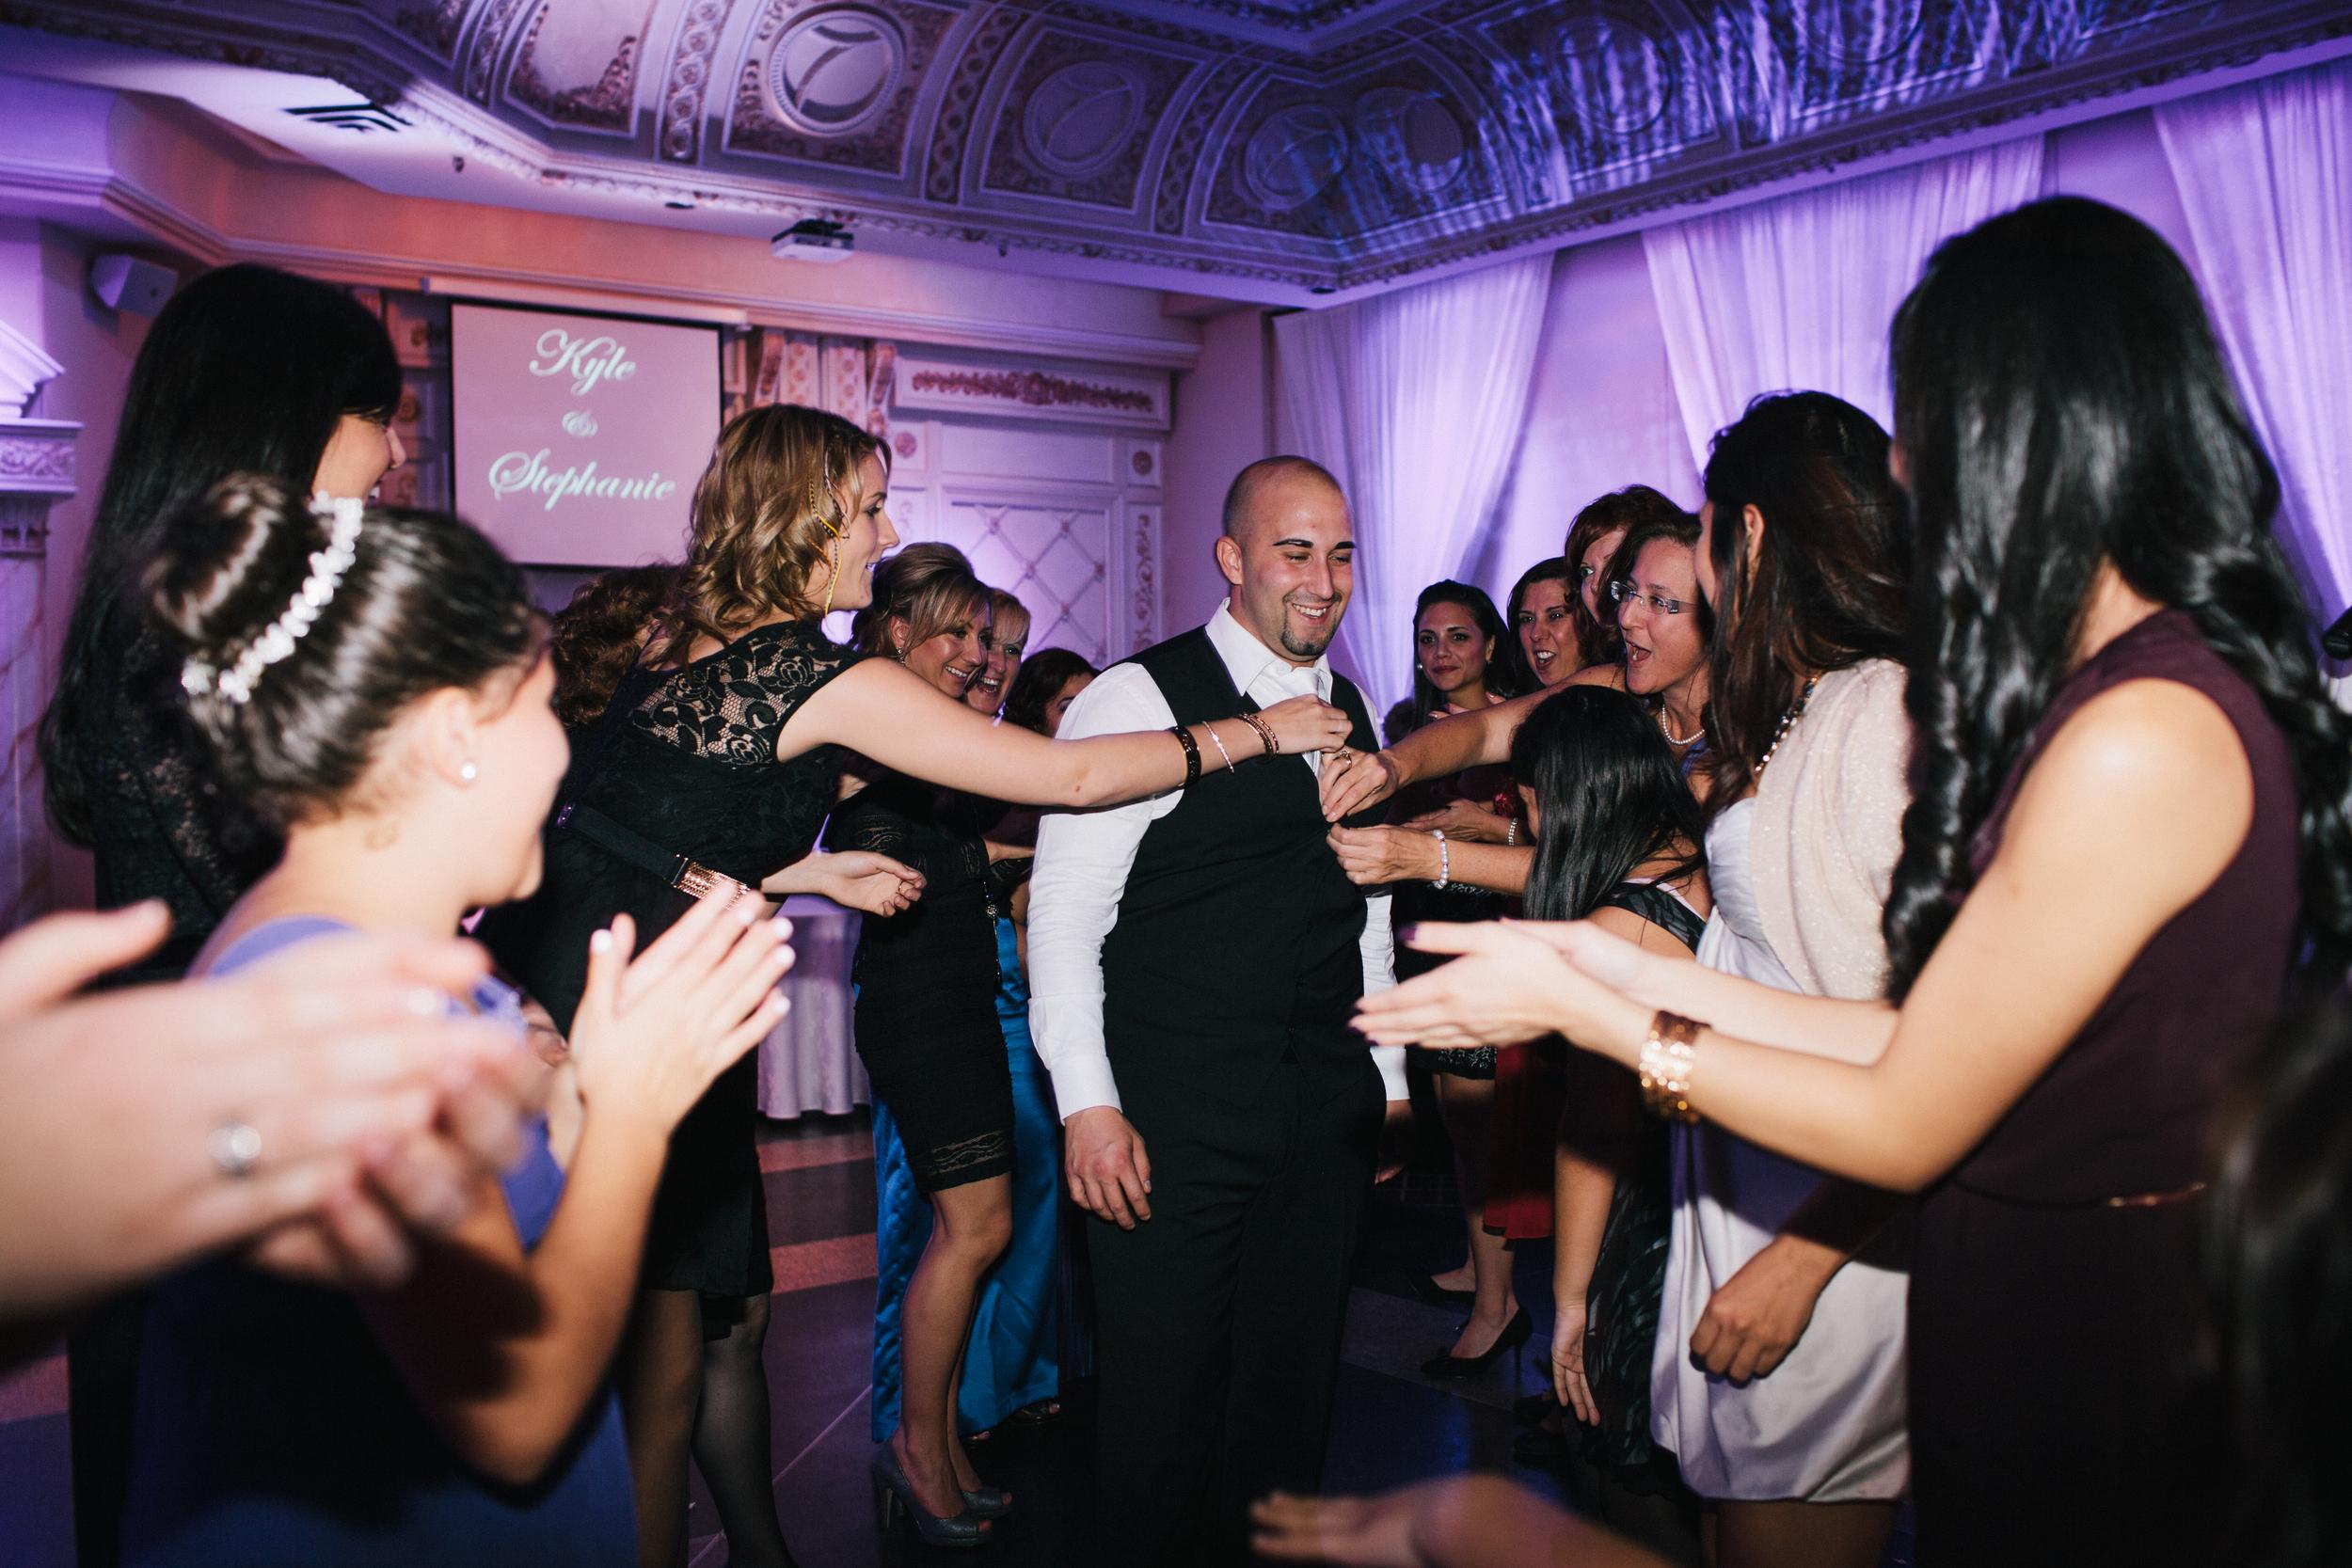 Stephanie-Kyle-paradise-banquet-hall-michael-rousseau-photography-best-toronto-wedding-photographer-documentary-wedding048.JPG